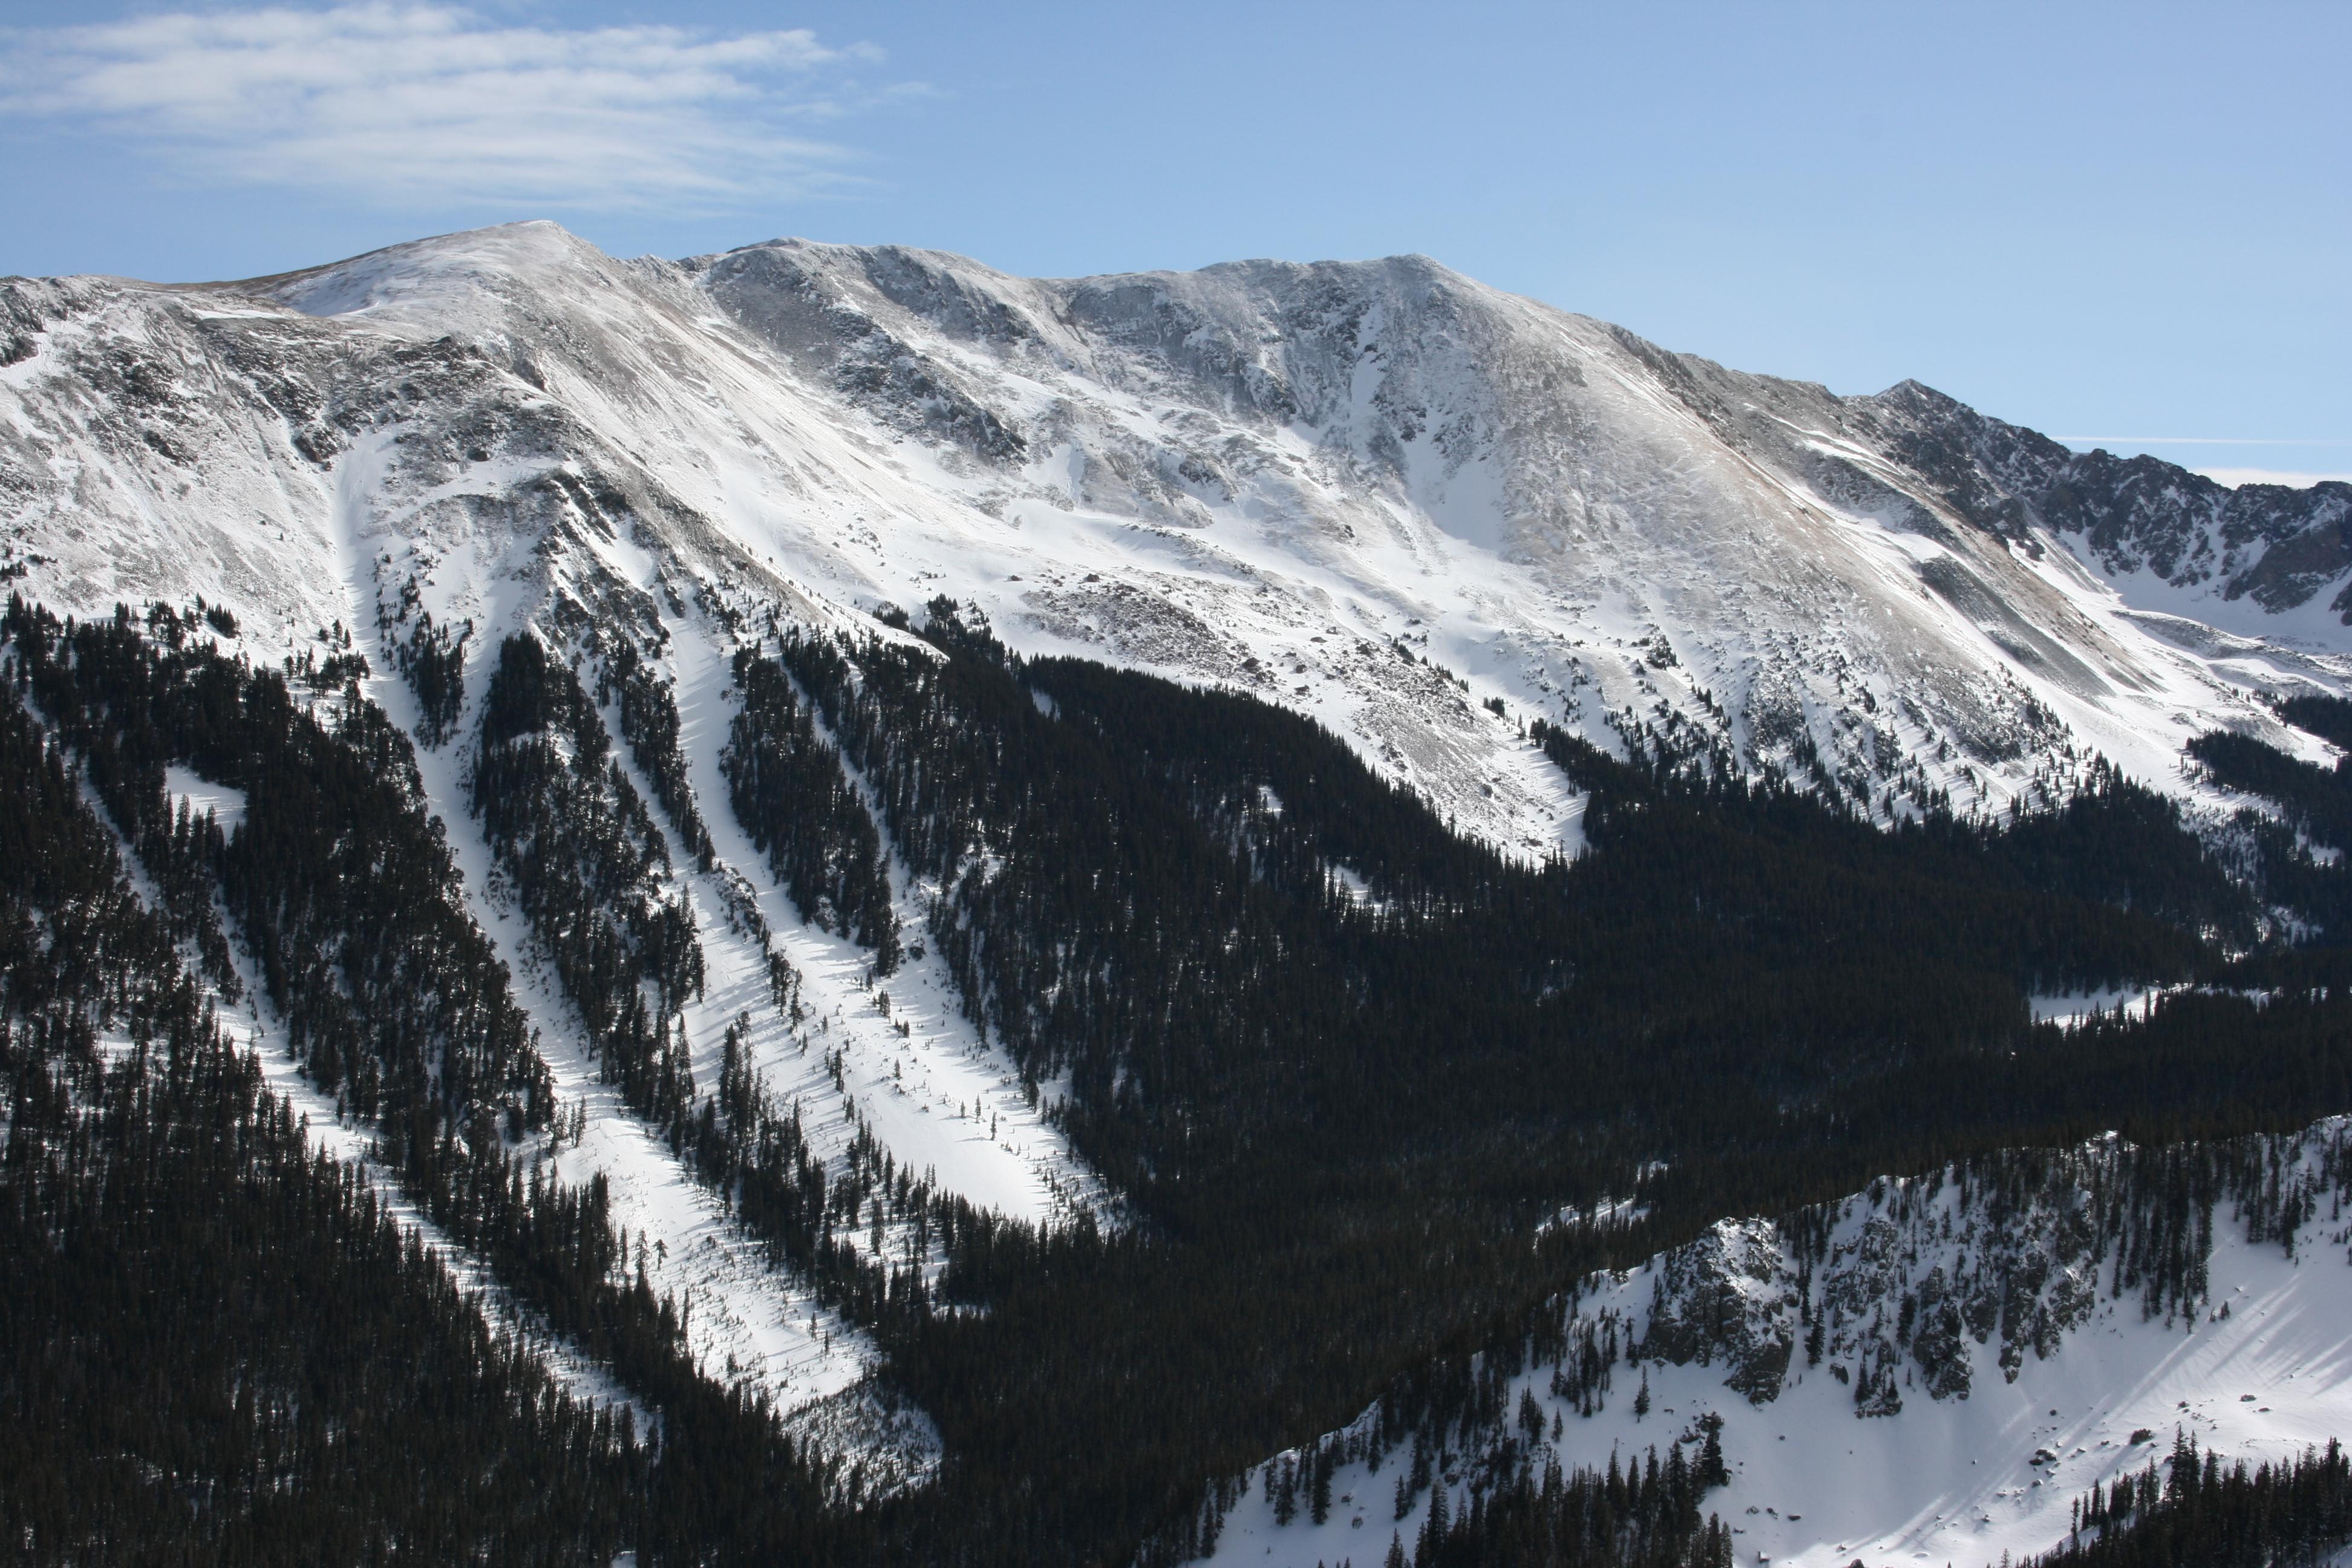 Wheeler Peak (13167', 4013 m), one long, difficult hike.